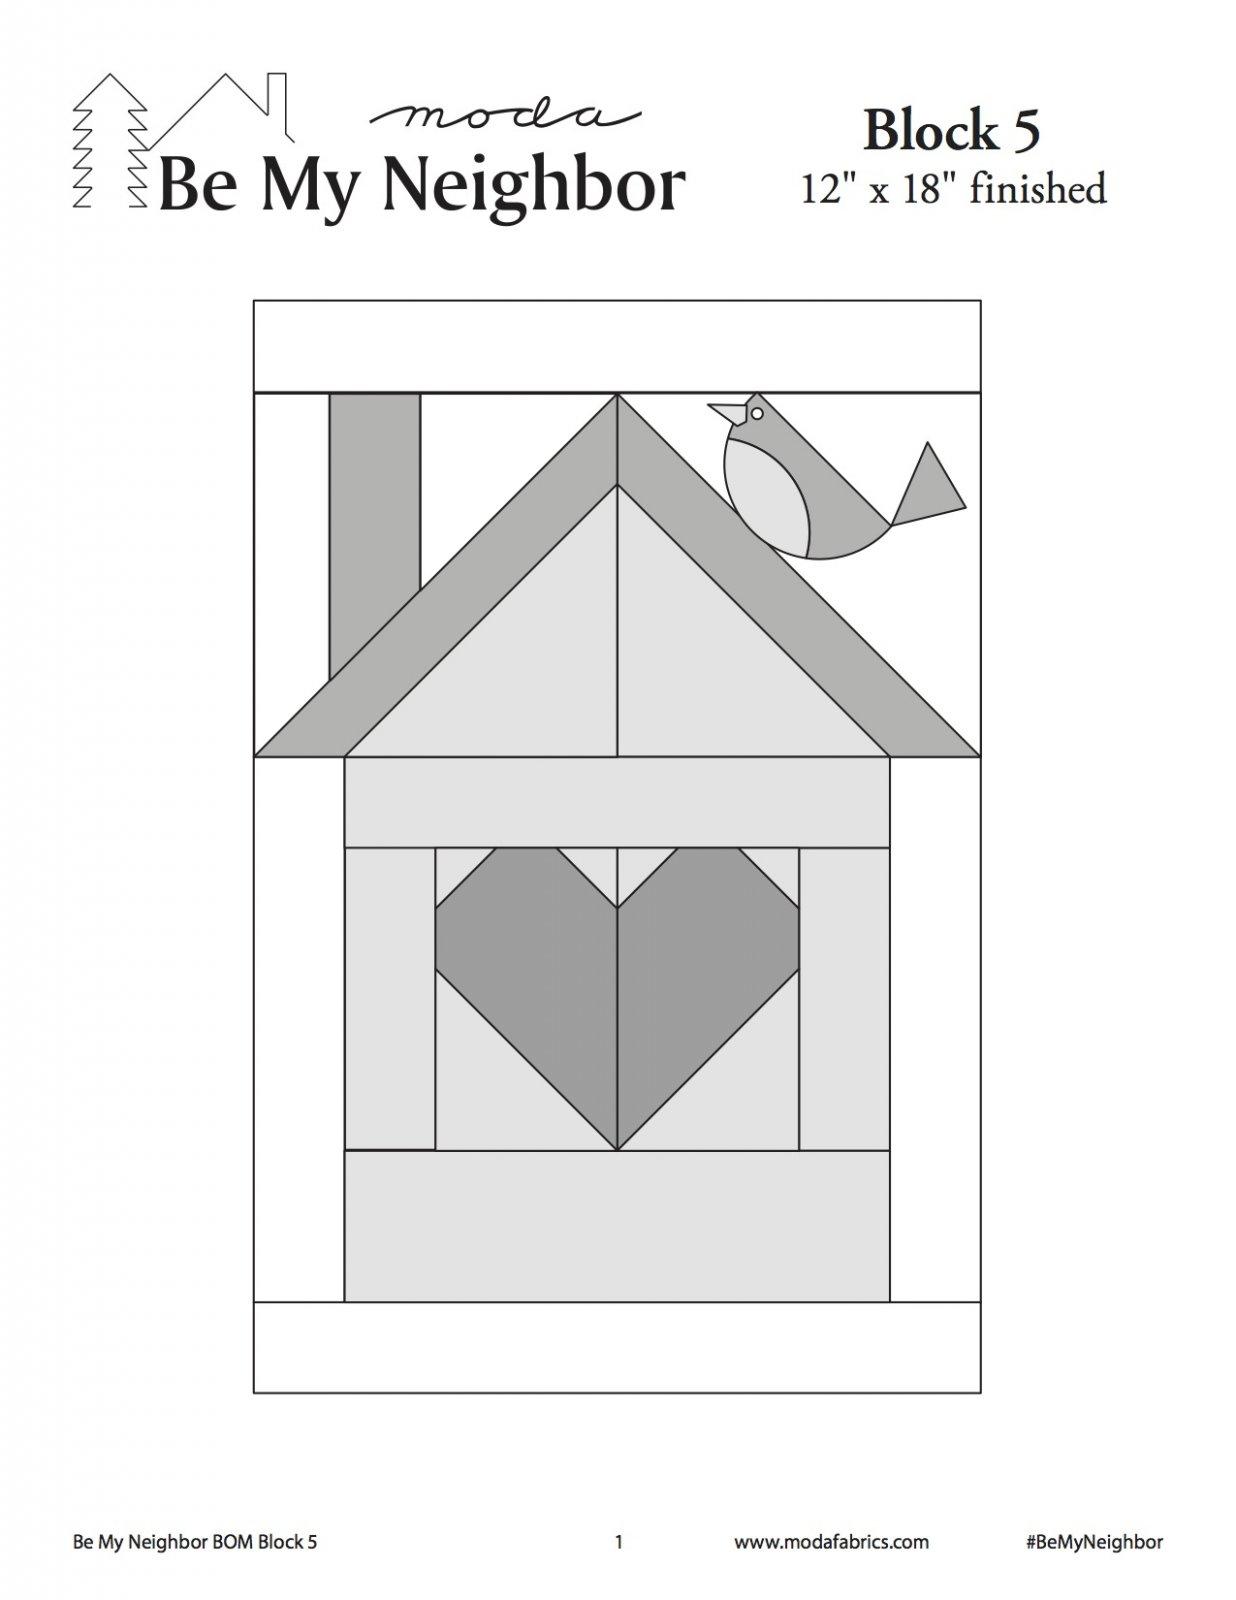 Be My Neighbor Quilt Along Block 5